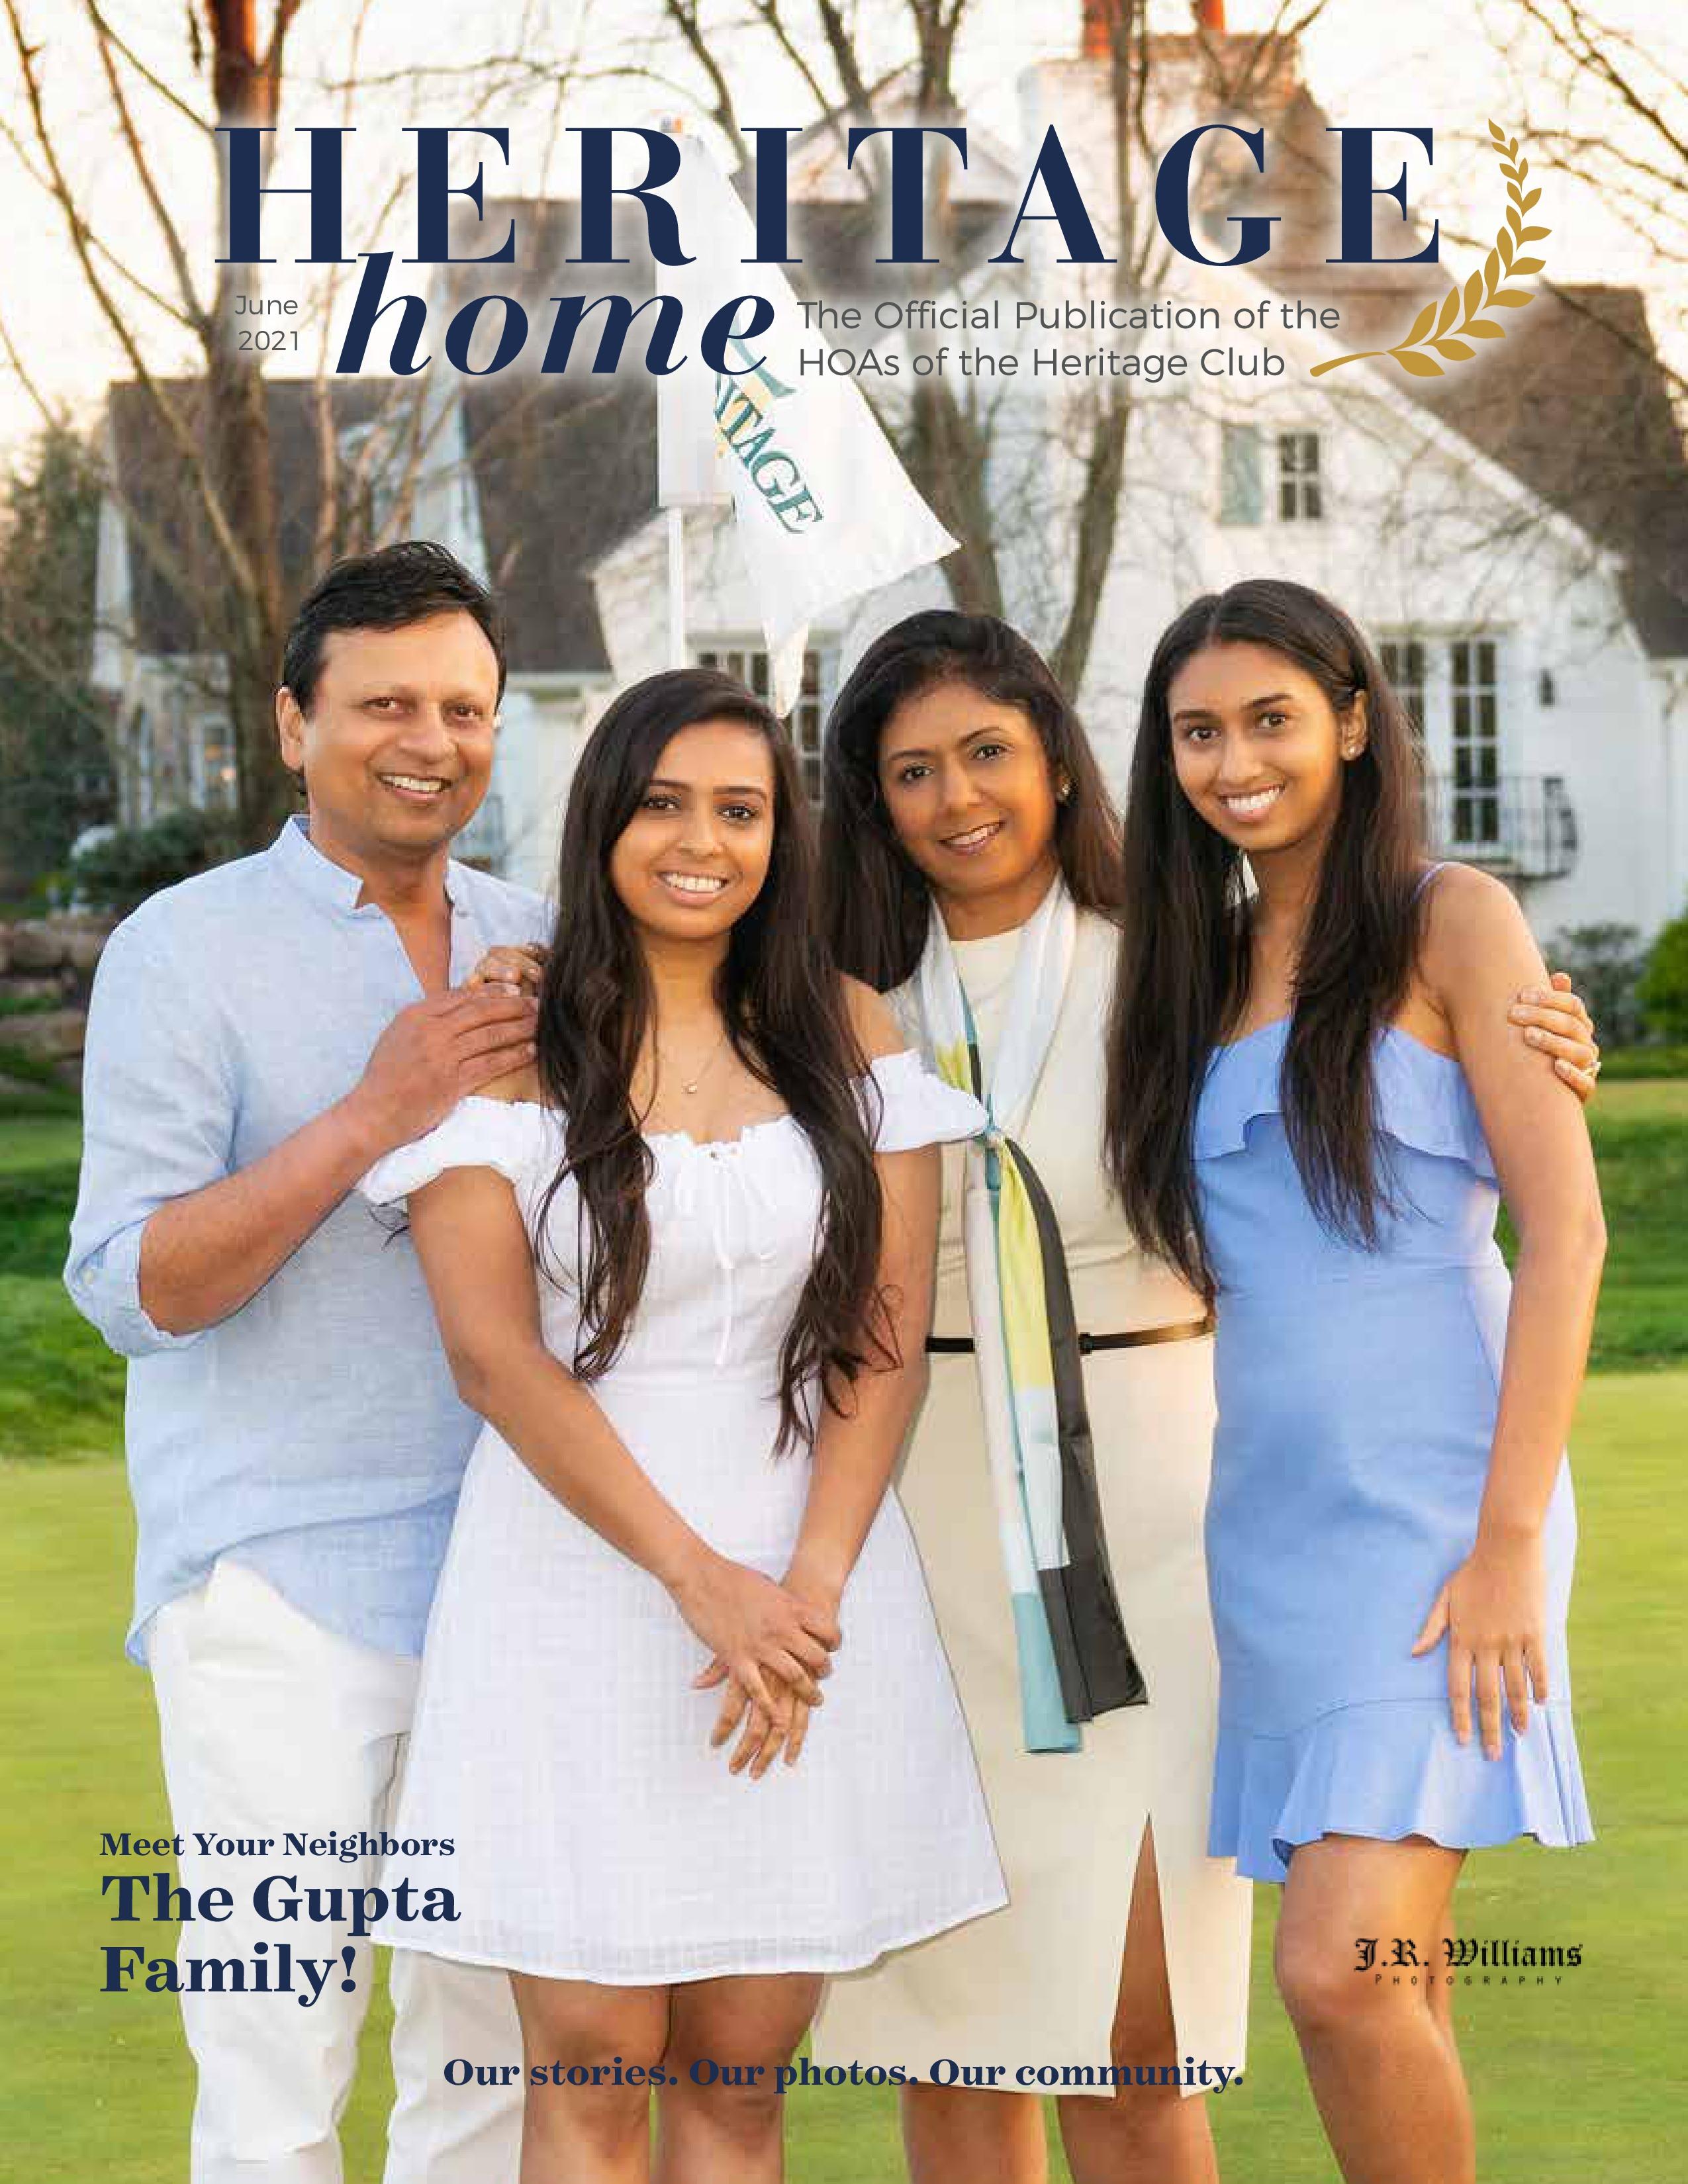 Heritage Home 2021-06-01